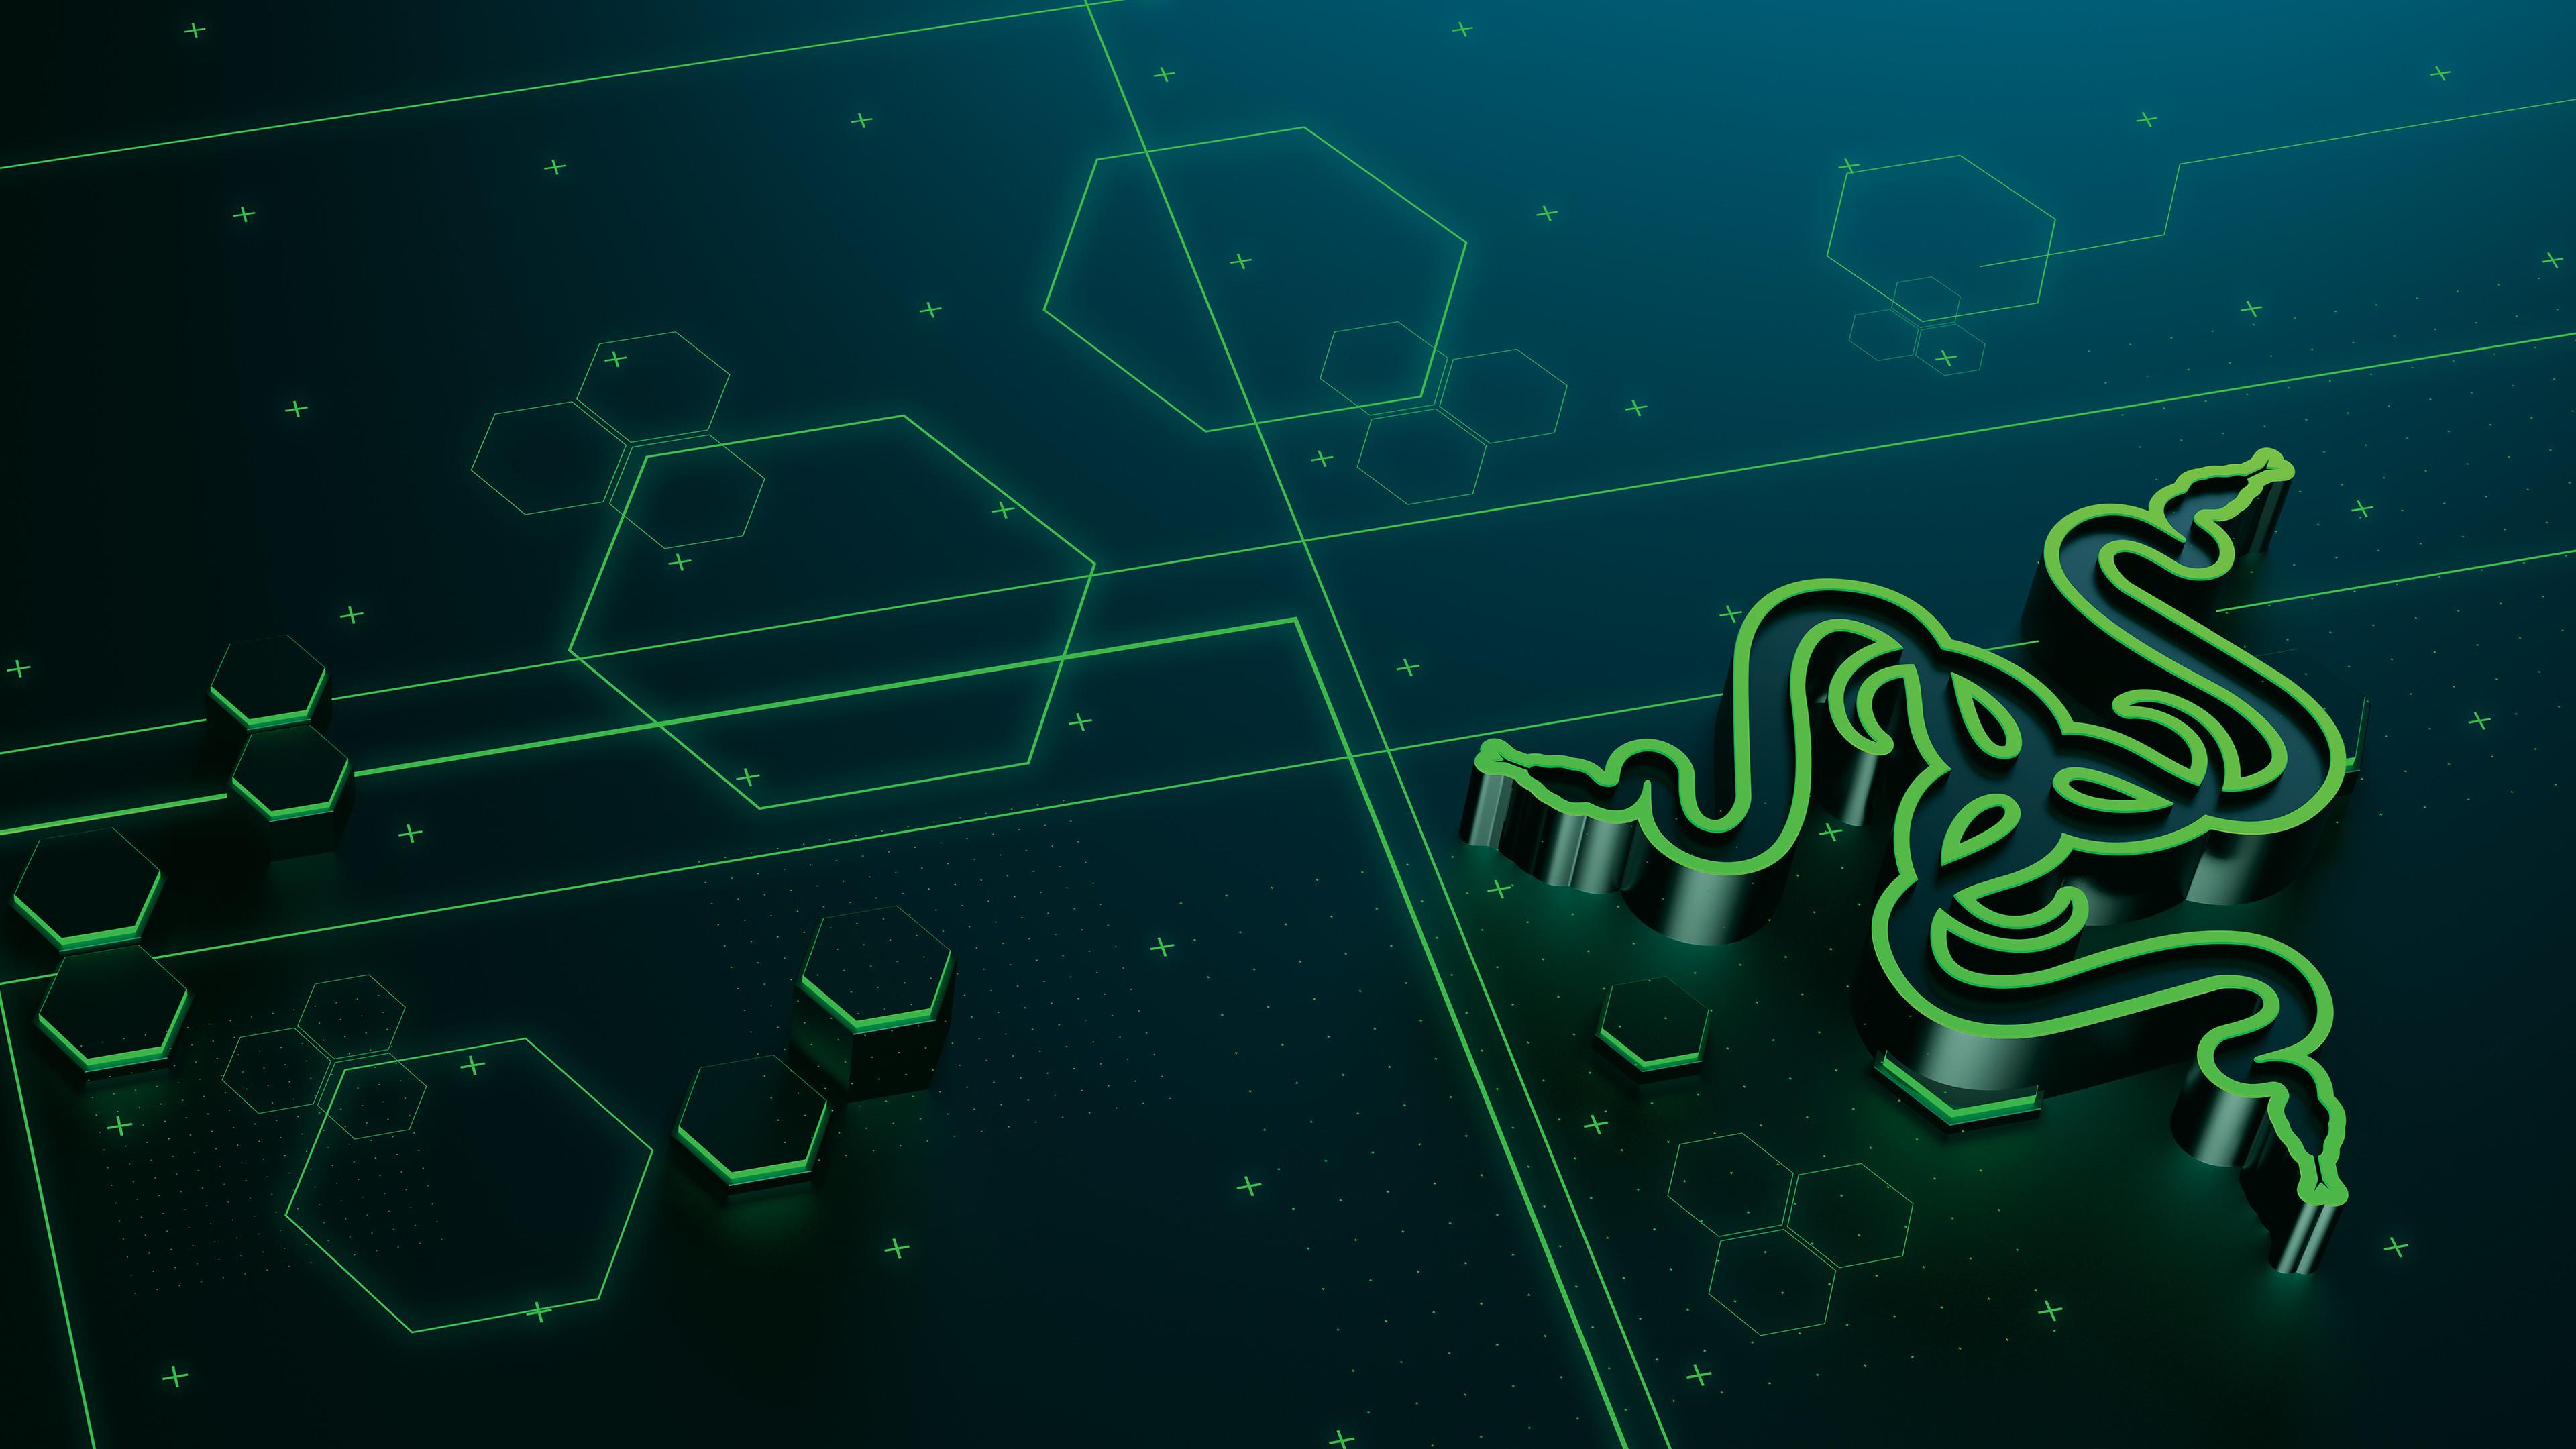 Razer Desktop Background 4K Wallpaper